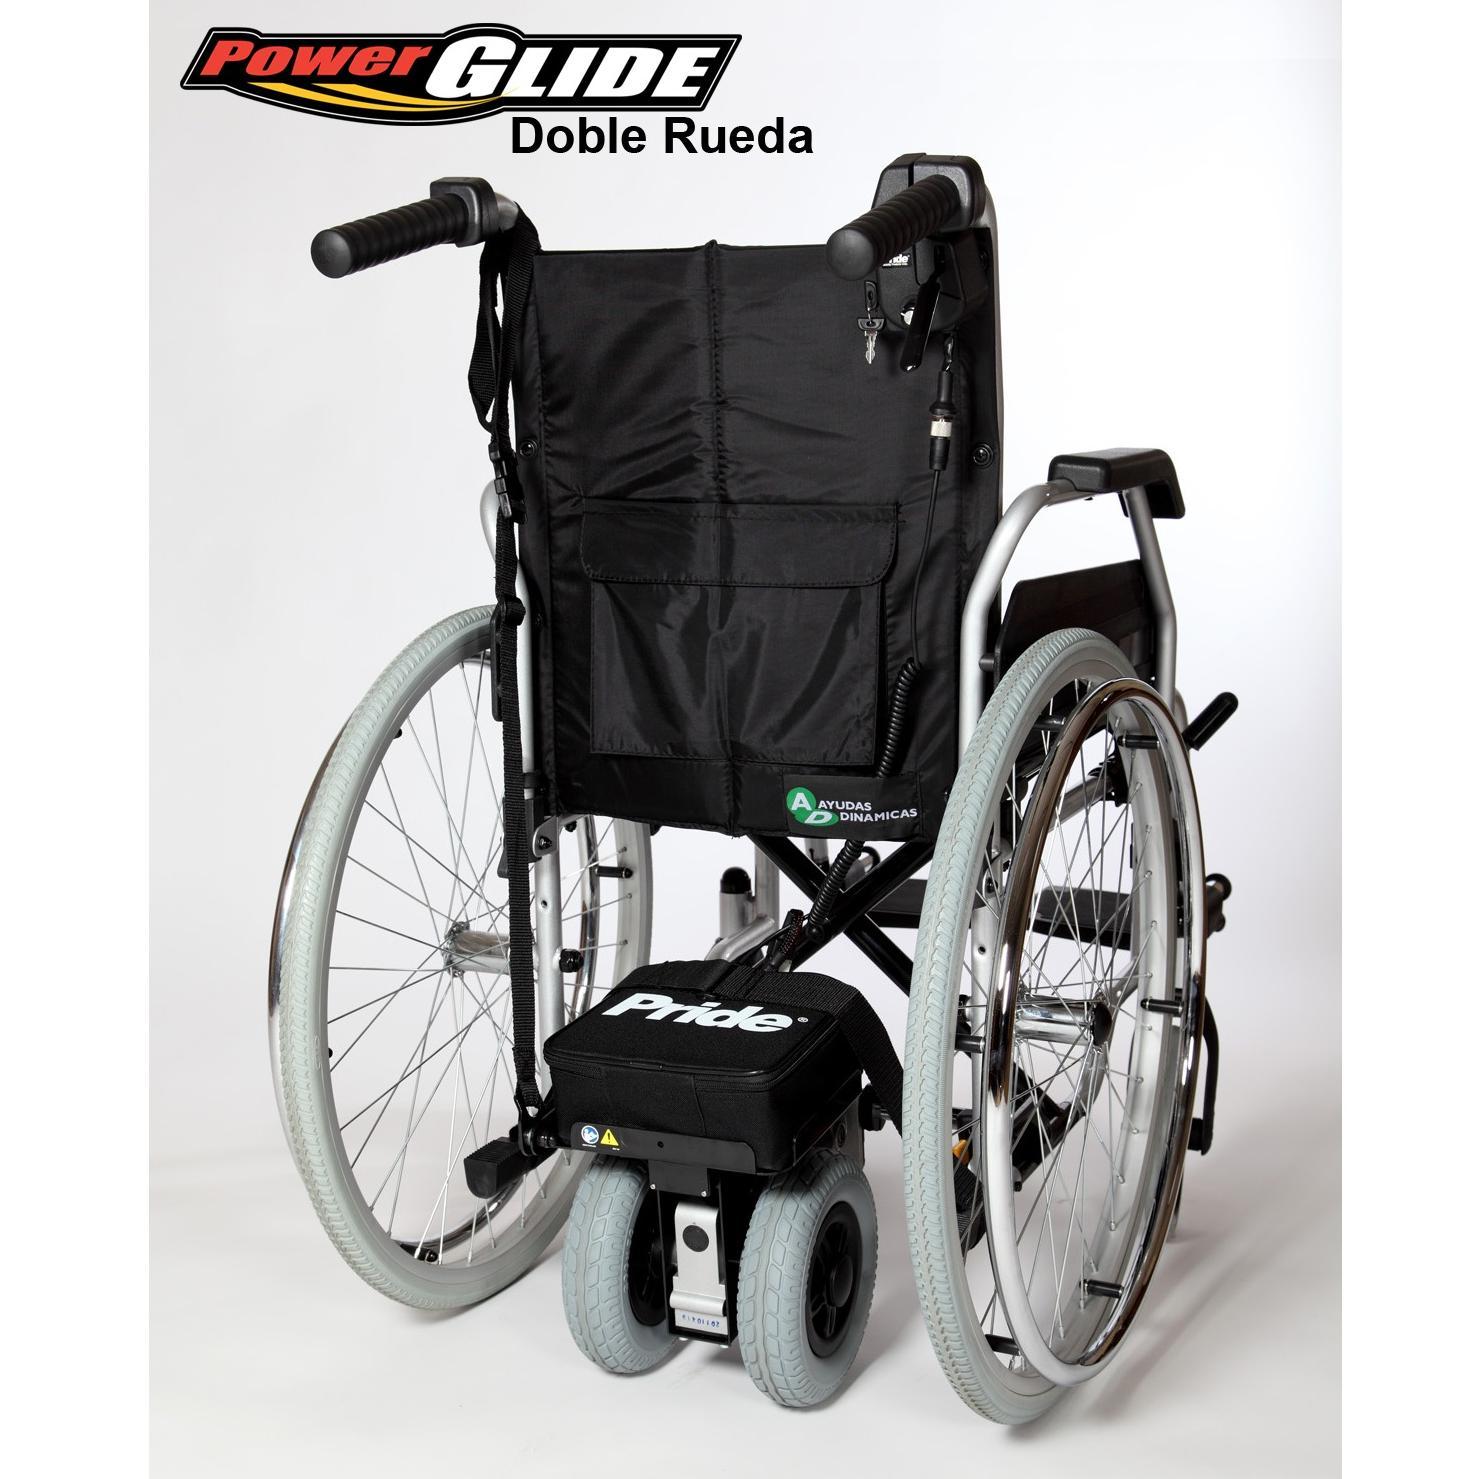 Motor para silla de ruedas convencional powerglide productos de farmacia ortop dia diagonal mar - Motor silla de ruedas ...